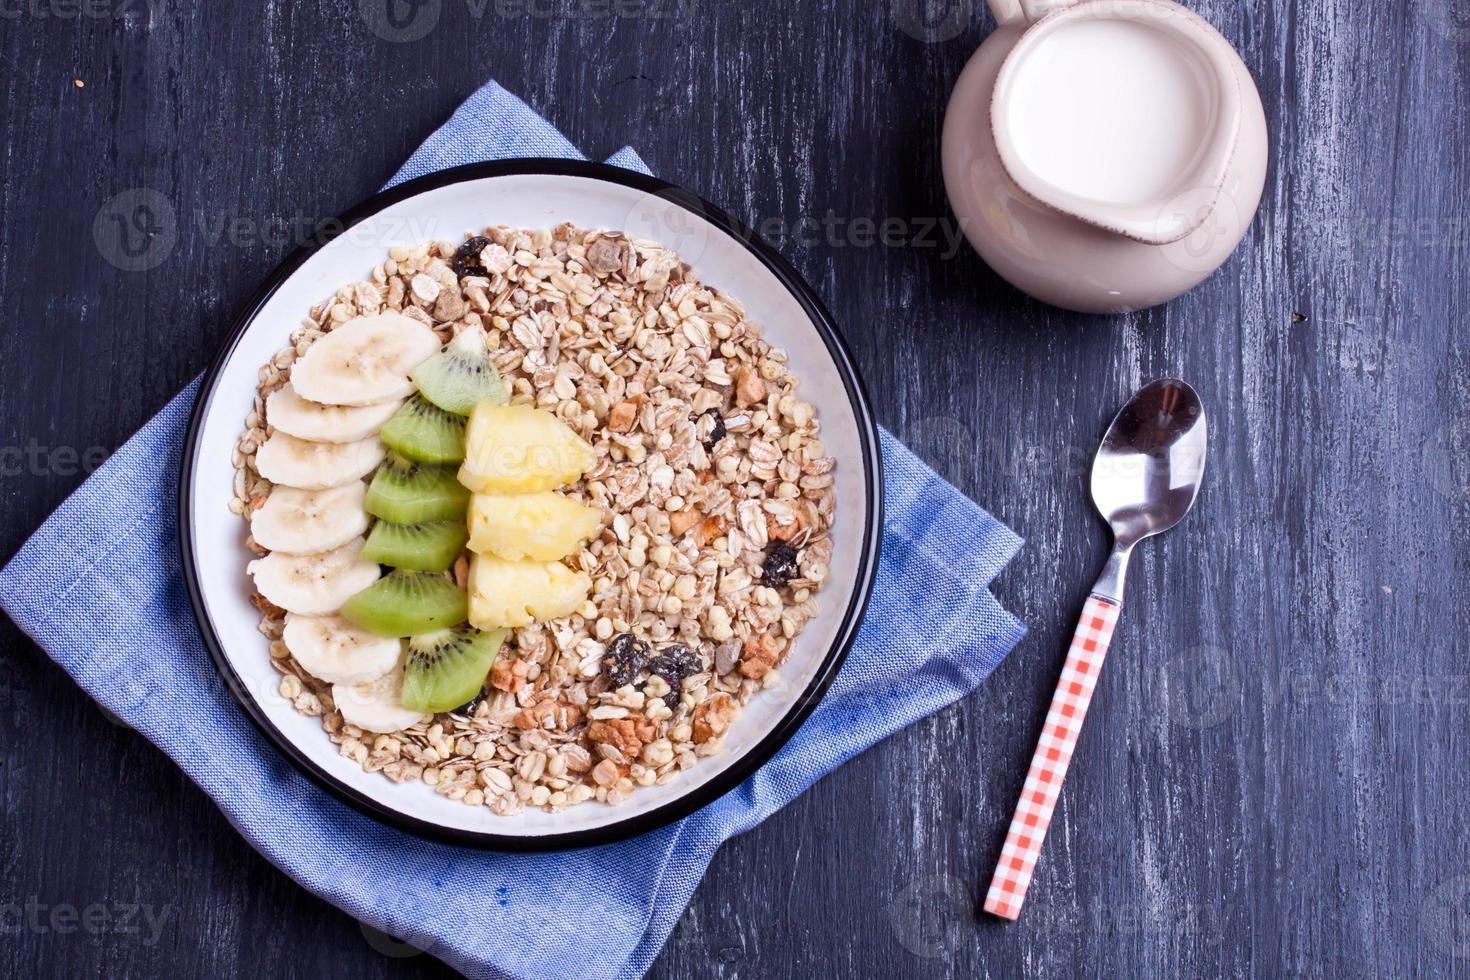 muesli with fruits photo